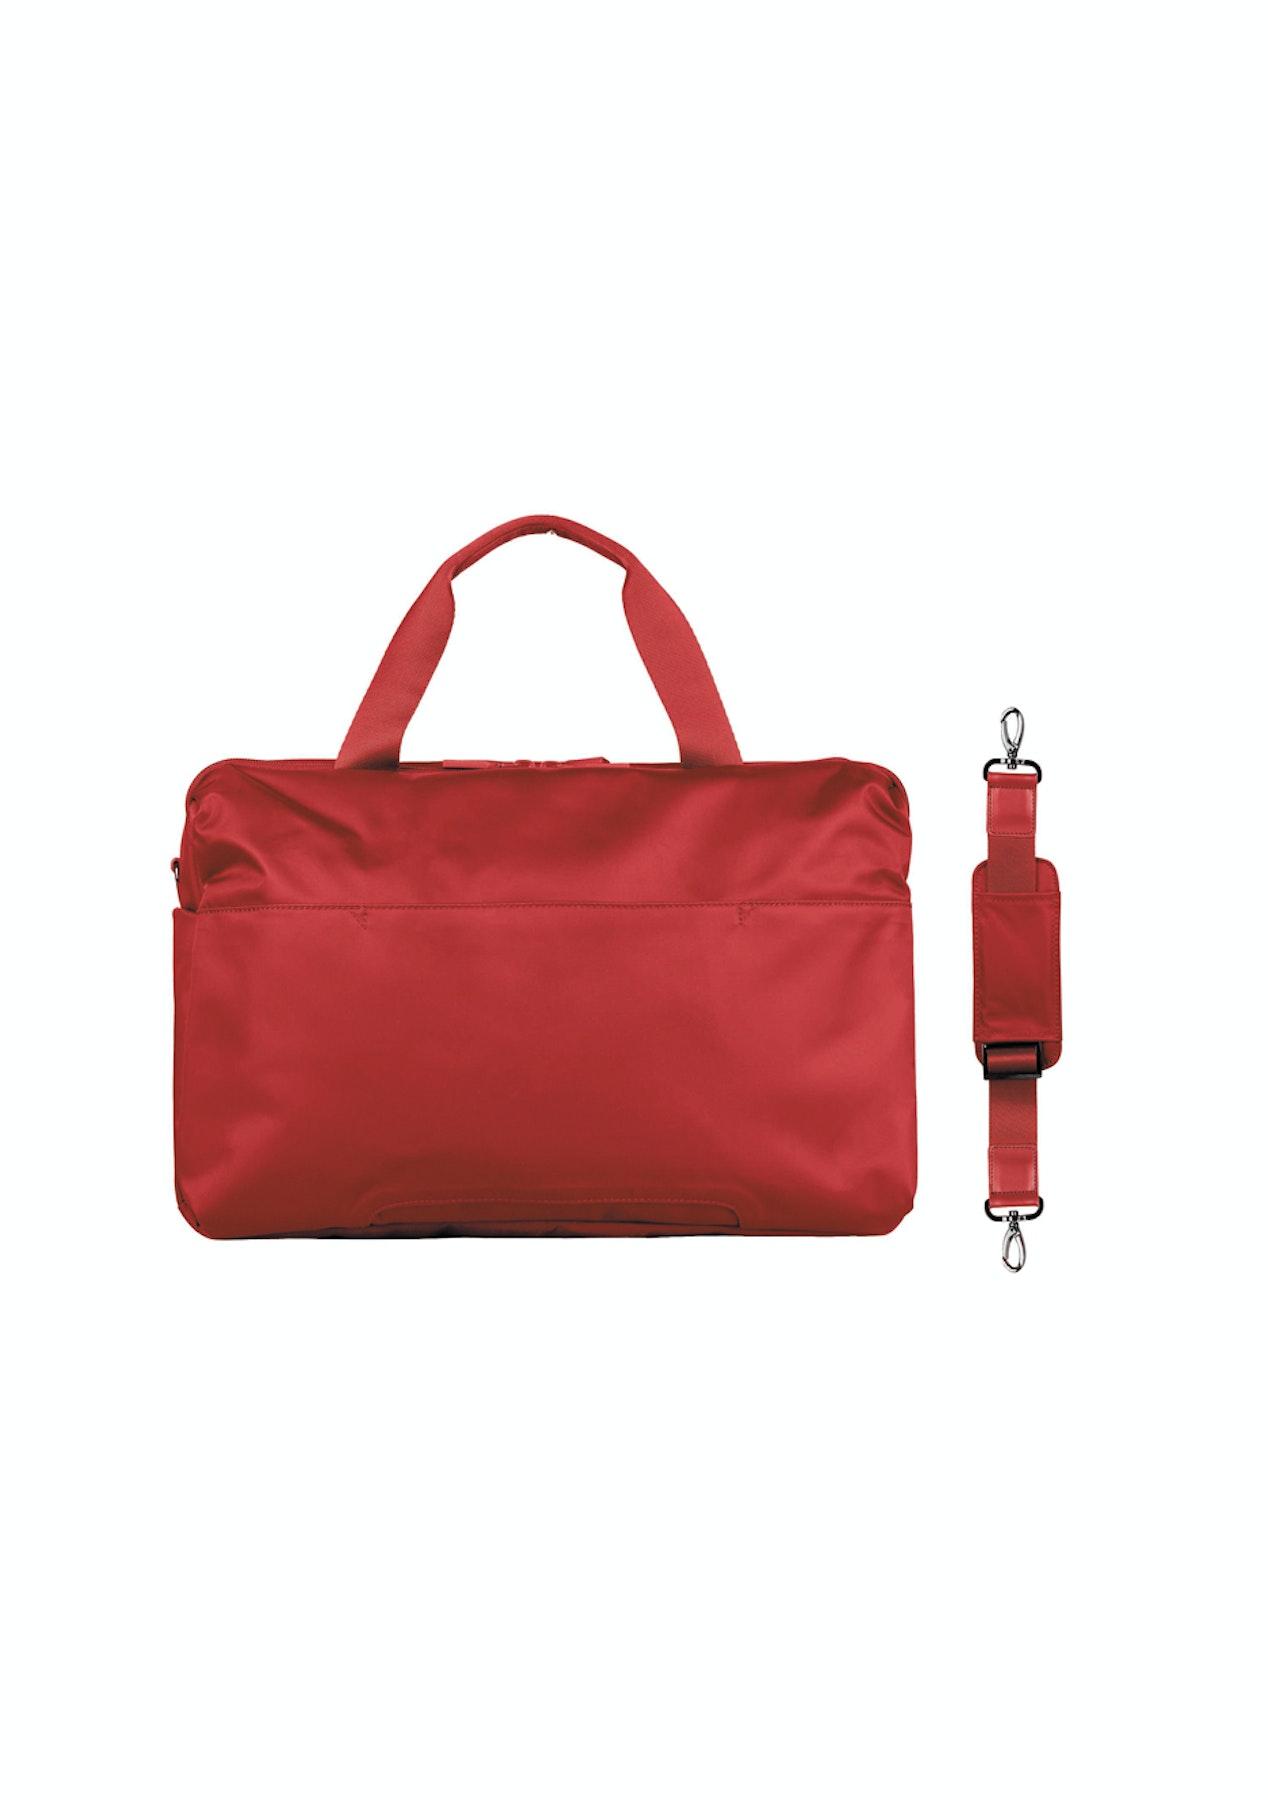 Lipault City Plume 24 Hour Bag - Ruby